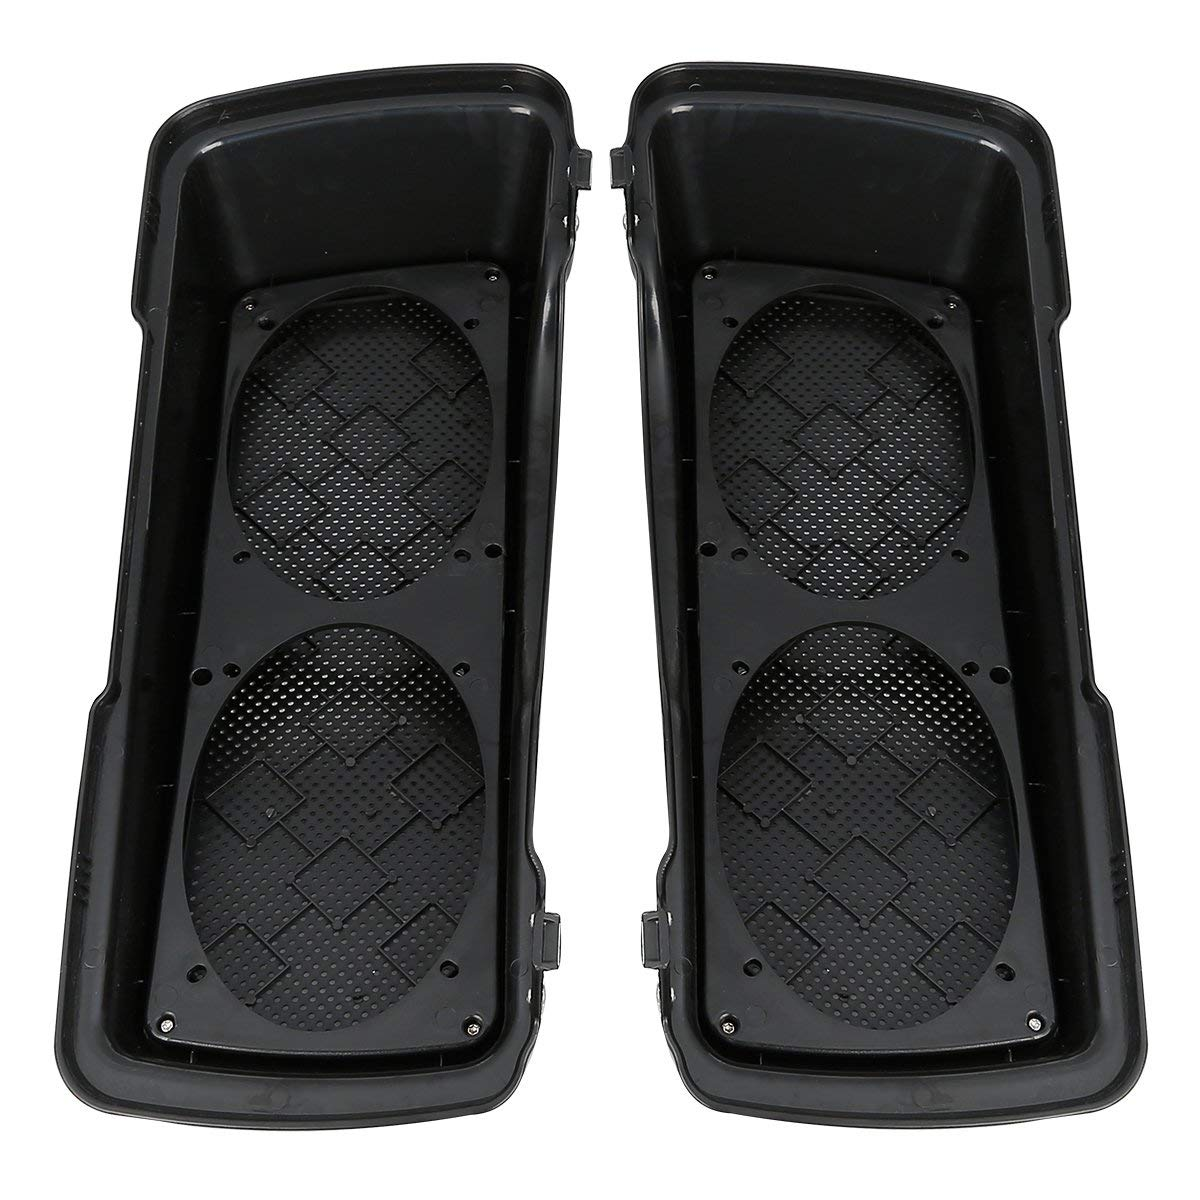 ALPHA MOTO Saddlebag Speaker Lids Compatible For Harley Davidson Touring Models Road King Electra Street Road Glide 1994-2013 FLHR FLHRC1 FLHS FLHT FLHTC FLHX FLHXSE FLHX FLHTK 1994-2013 Dual lids